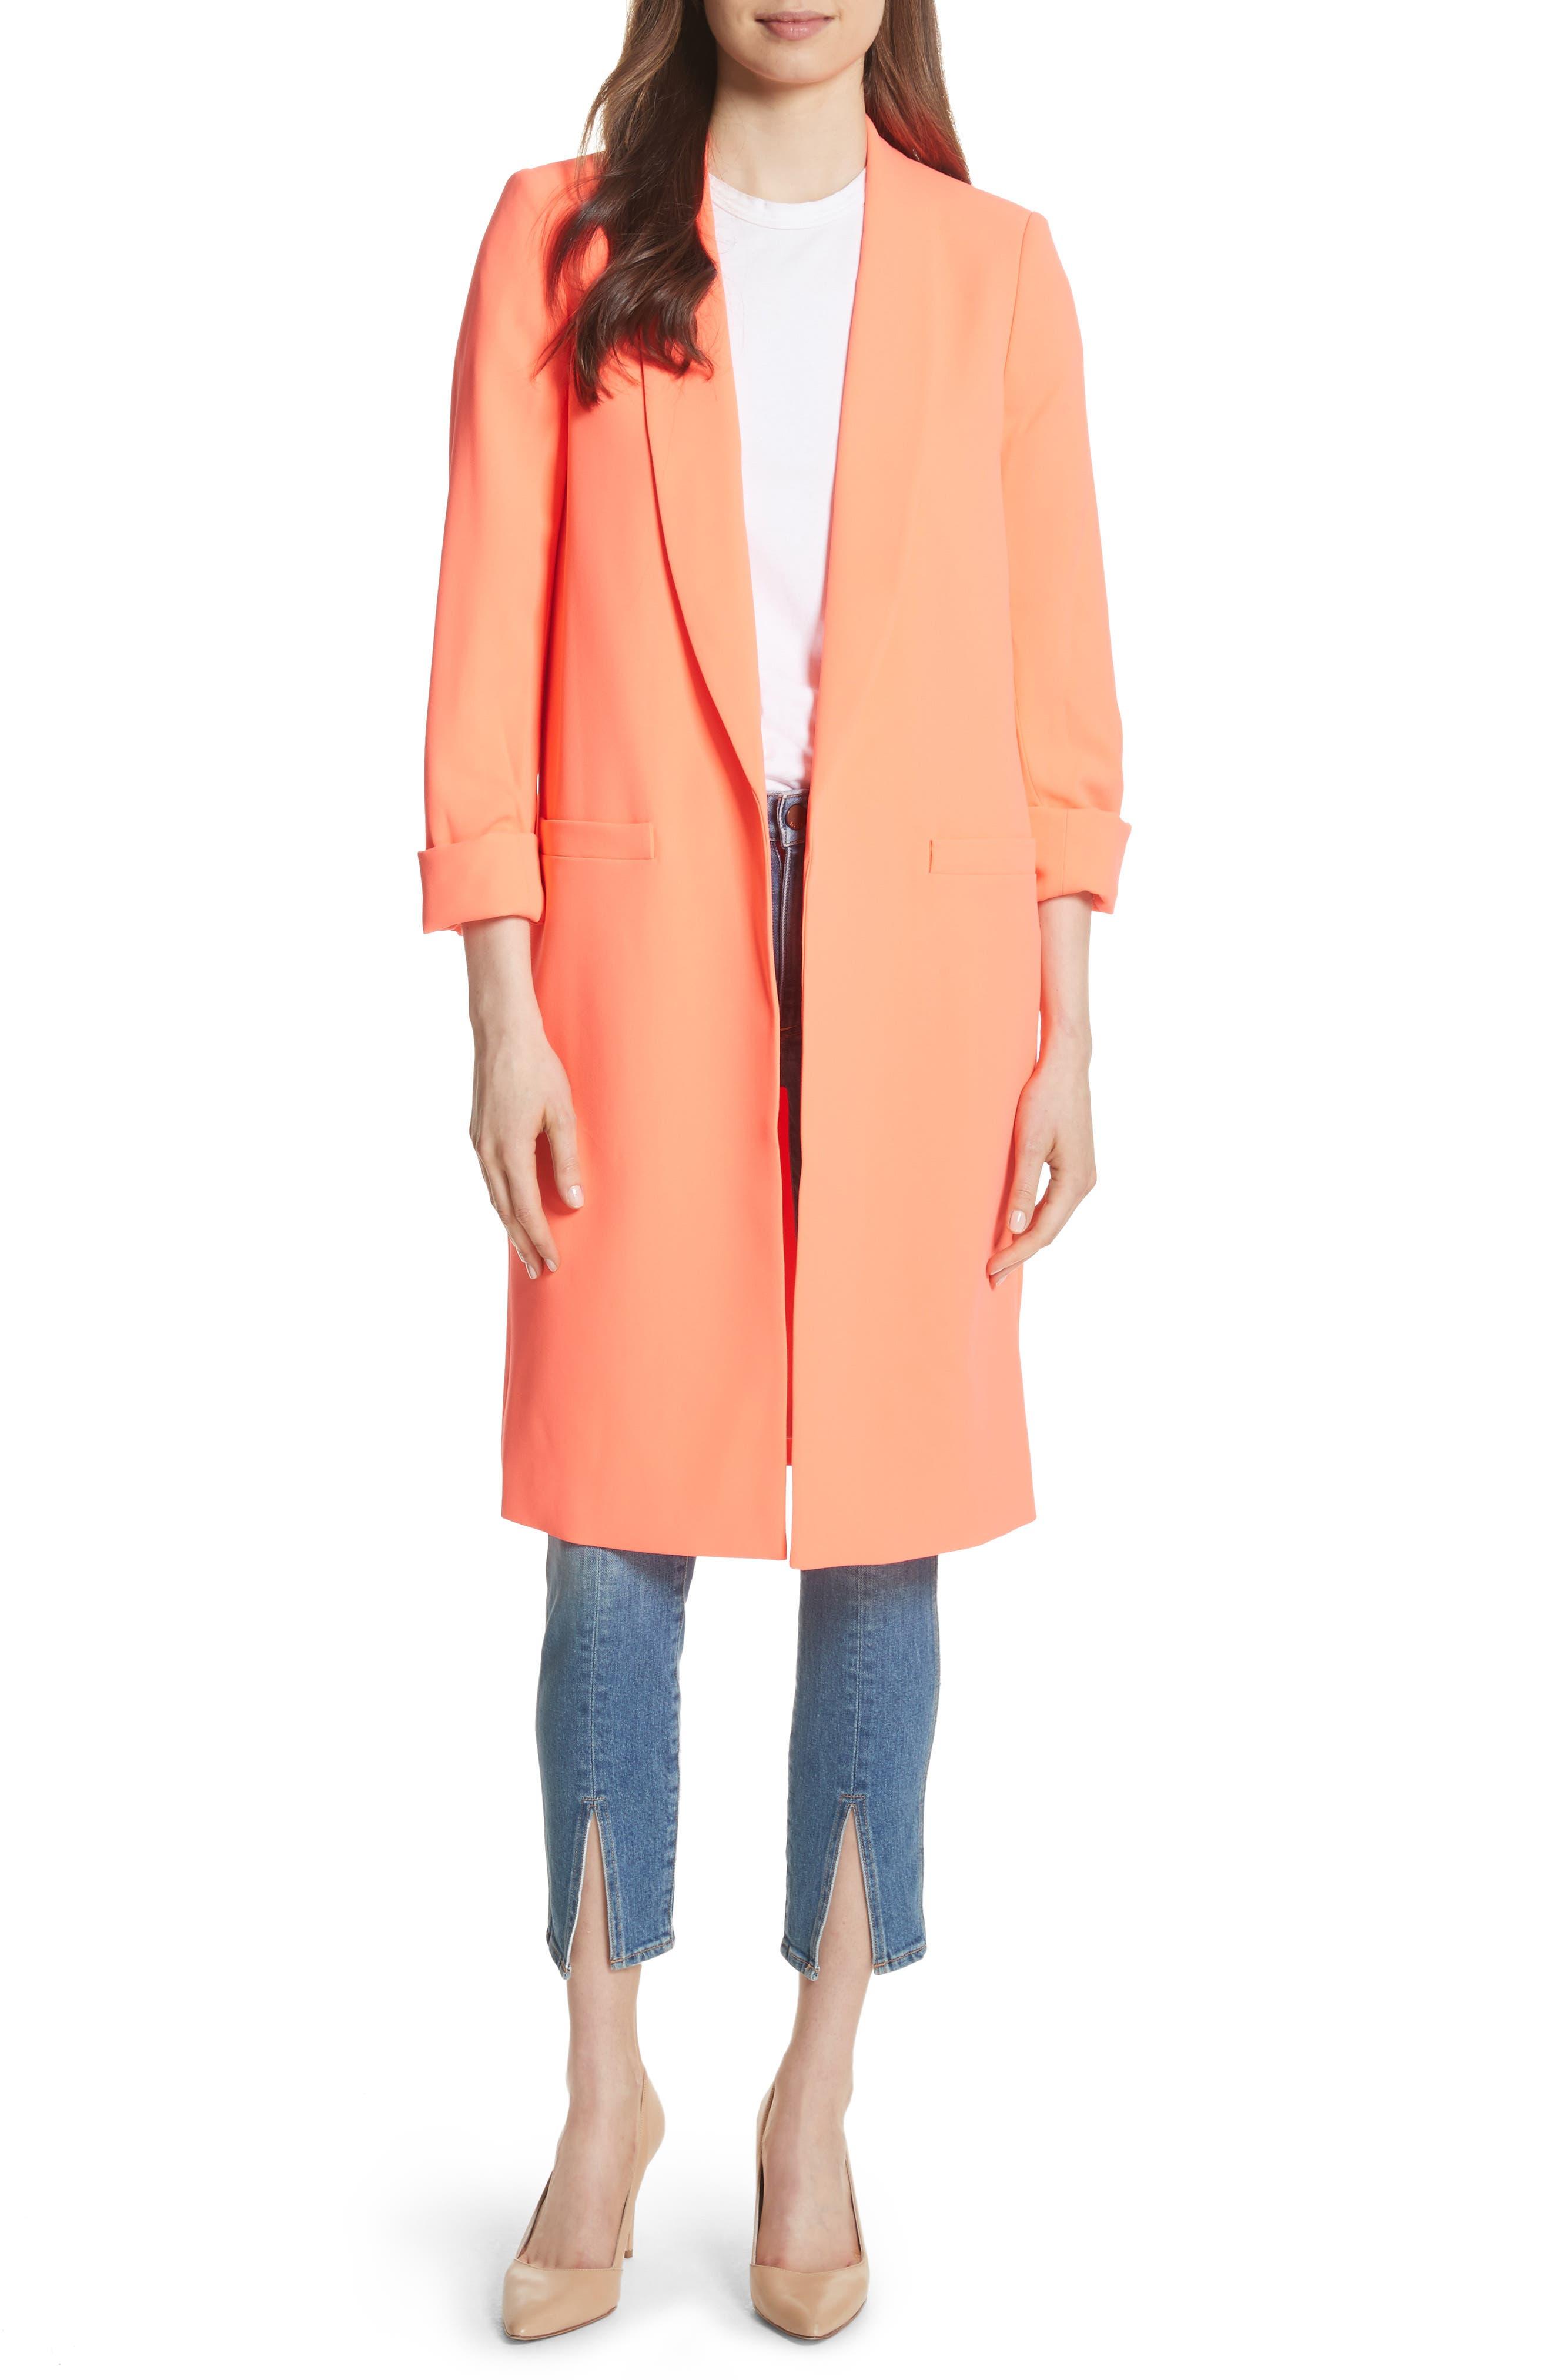 Alice + Olivia Kylie Shawl Collar Long Jacket